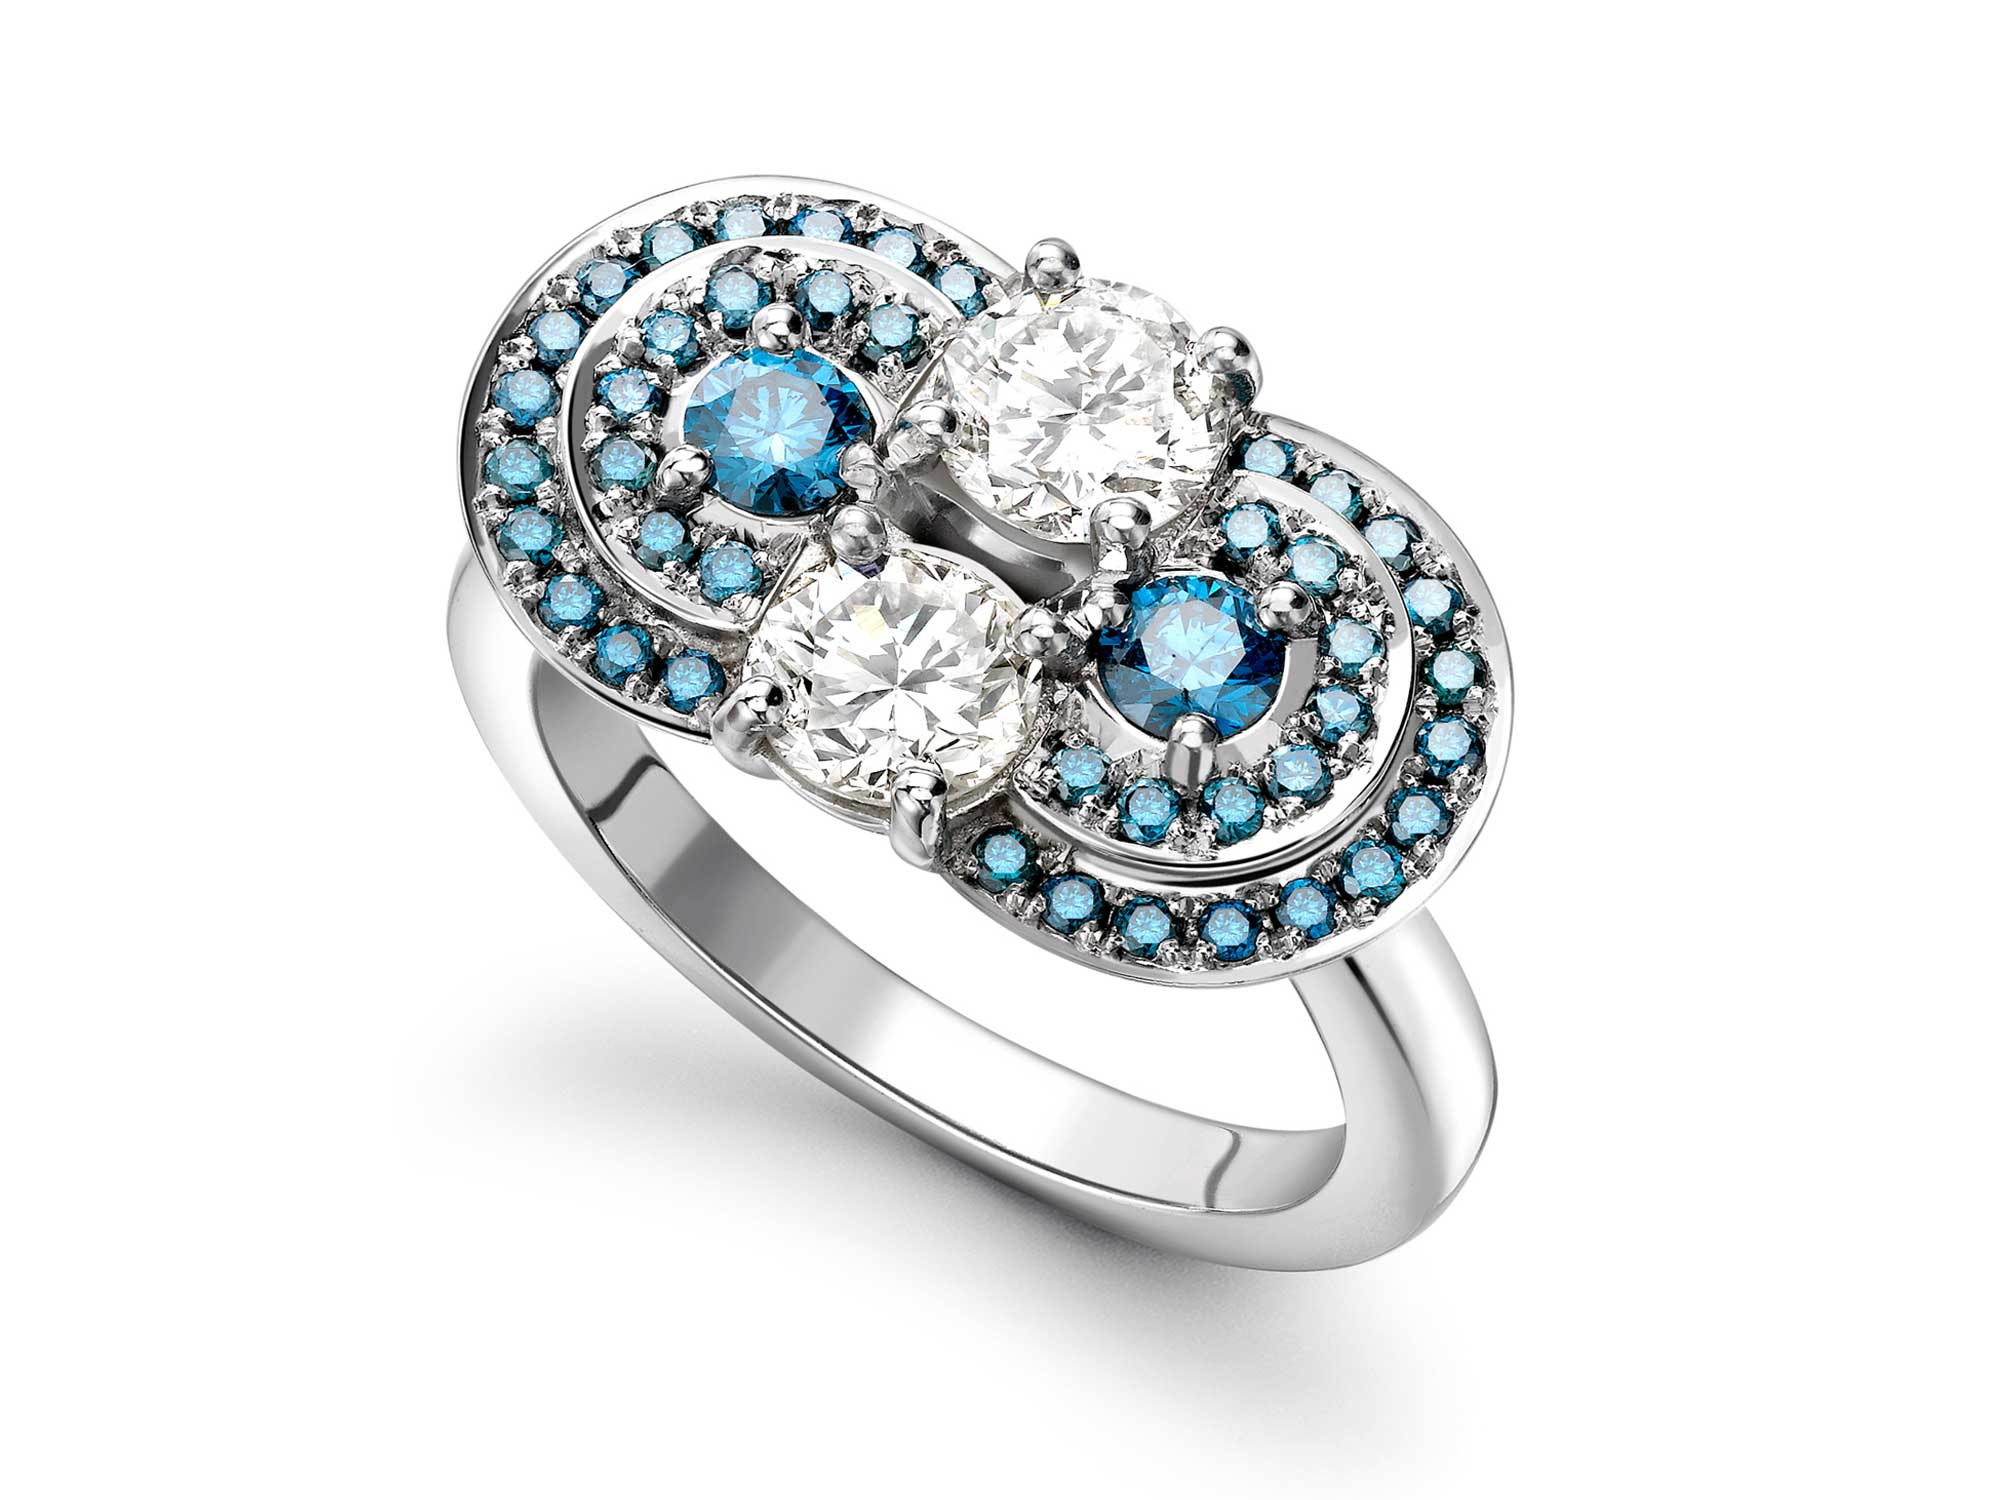 white gold engagement ring mia emma franklin london